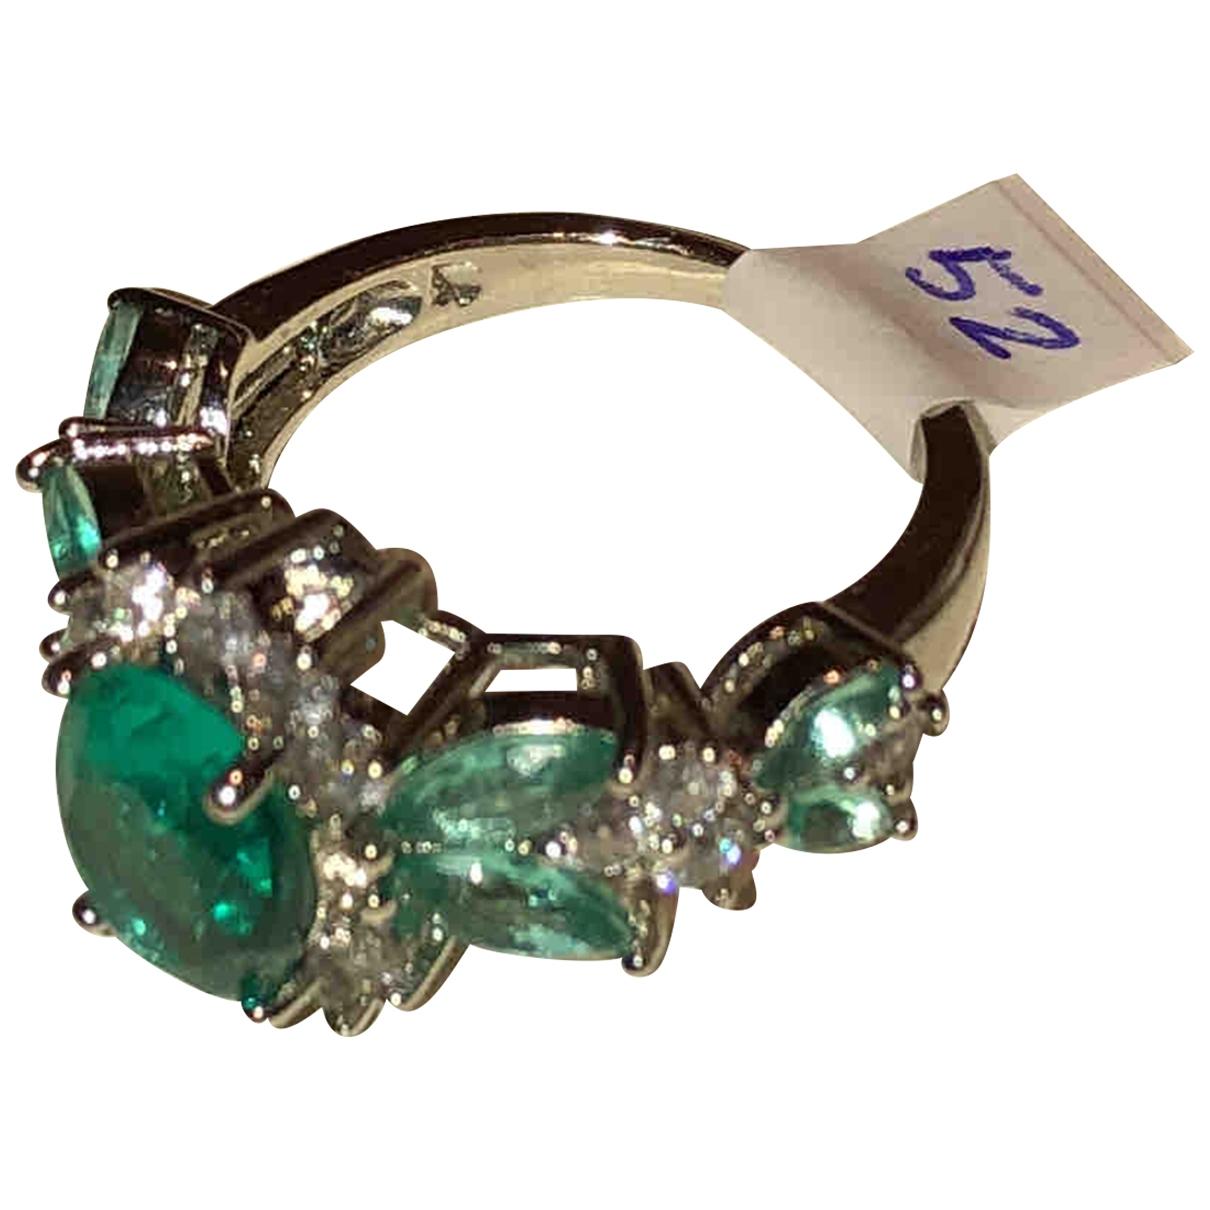 Non Signe / Unsigned \N Ring in  Gruen Silber